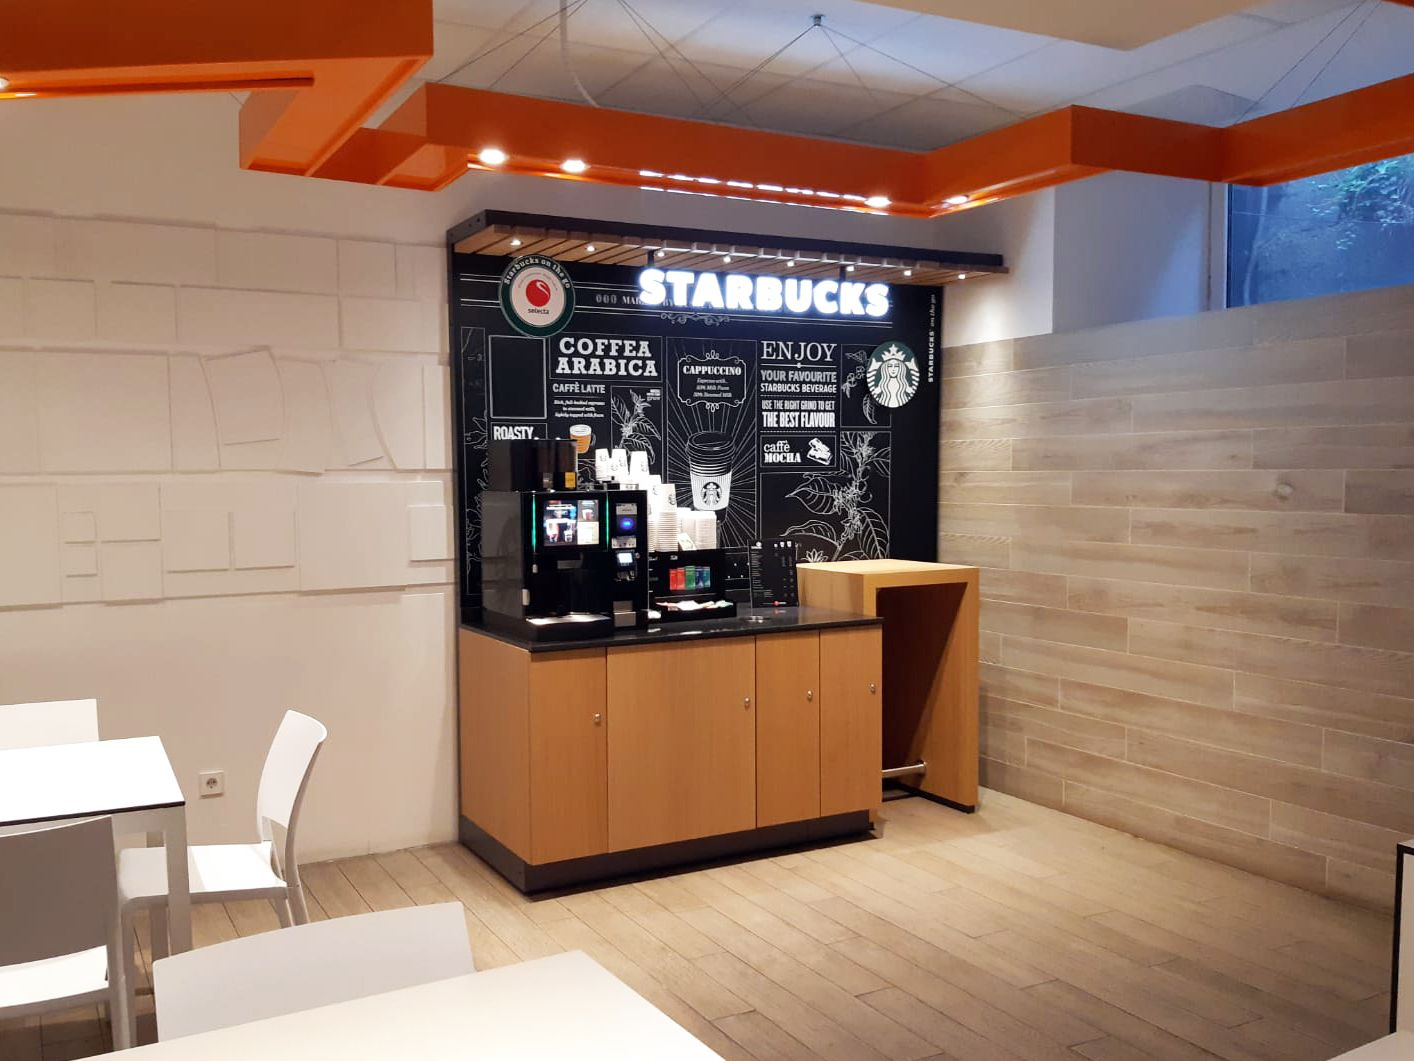 Fotografia Starbucks on the go en el Hospital La Paz